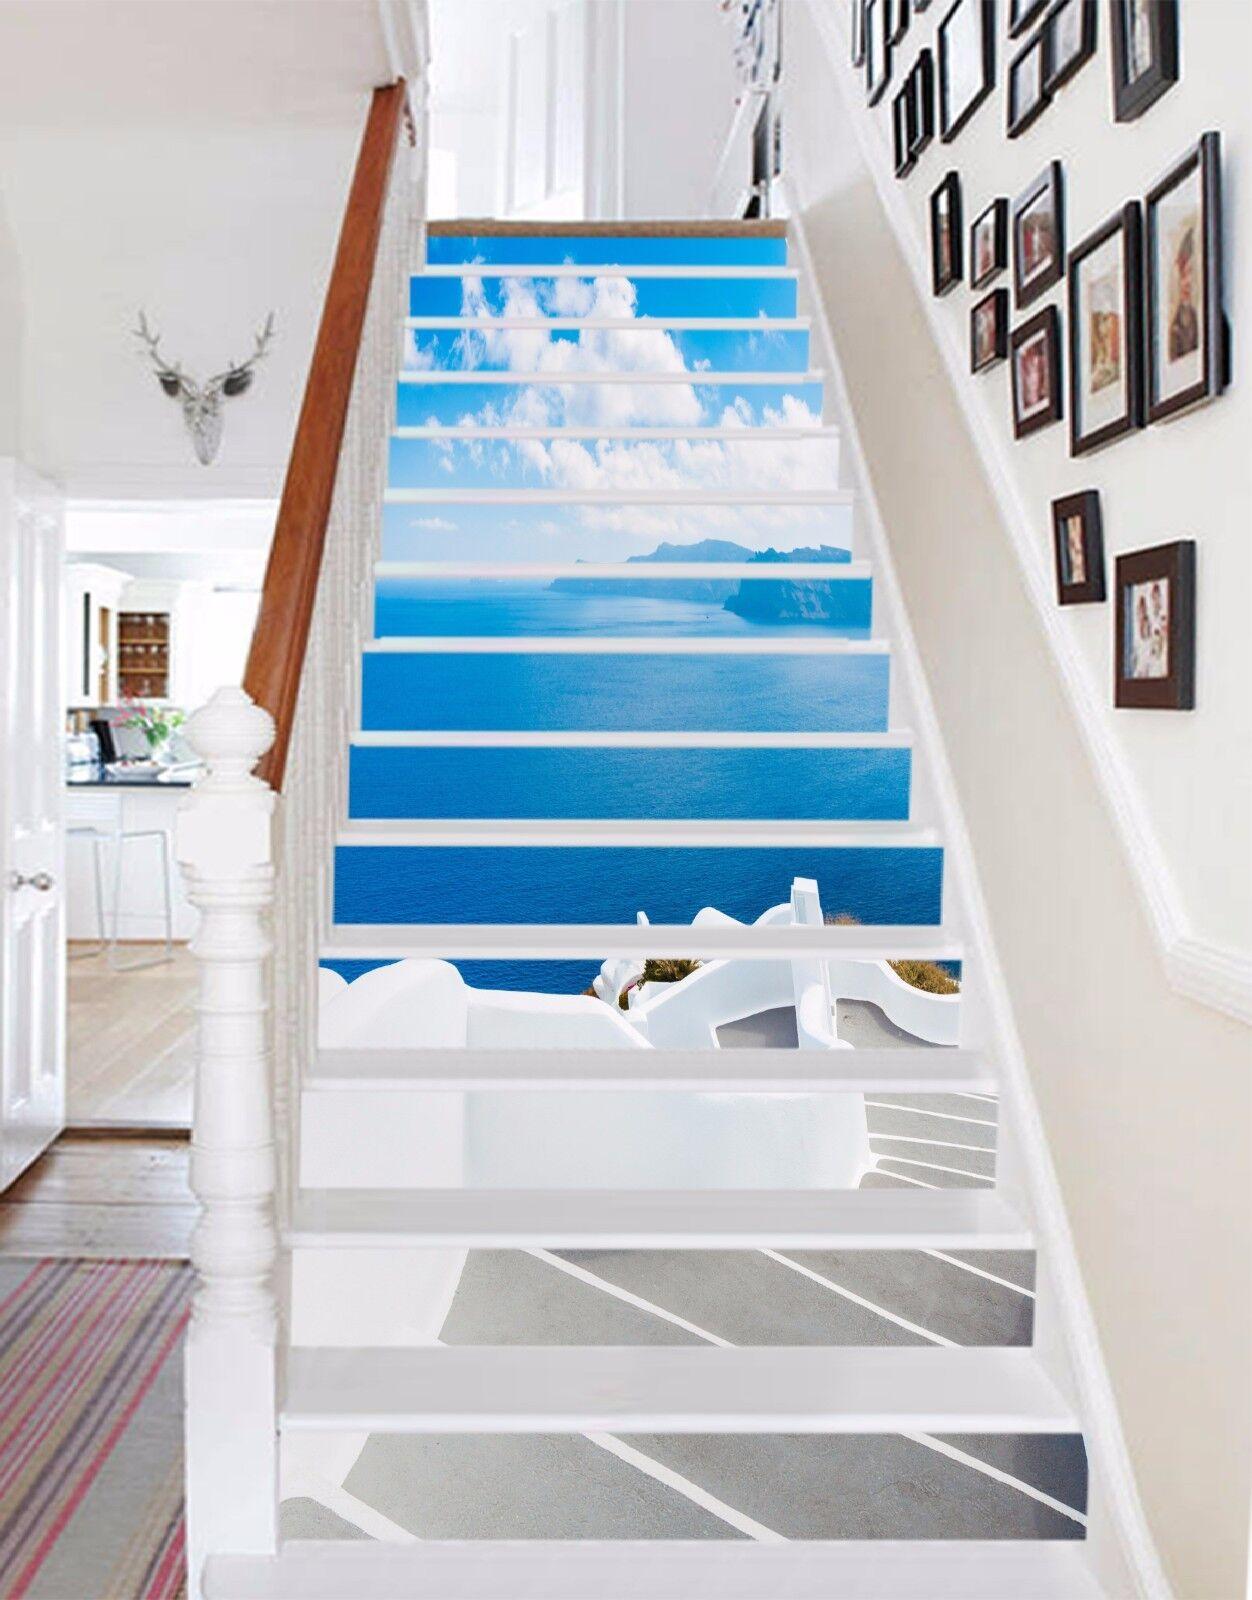 3D Stairs Big Sea 573 Risers Decoration Photo Mural Vinyl Decal Wallpaper CA